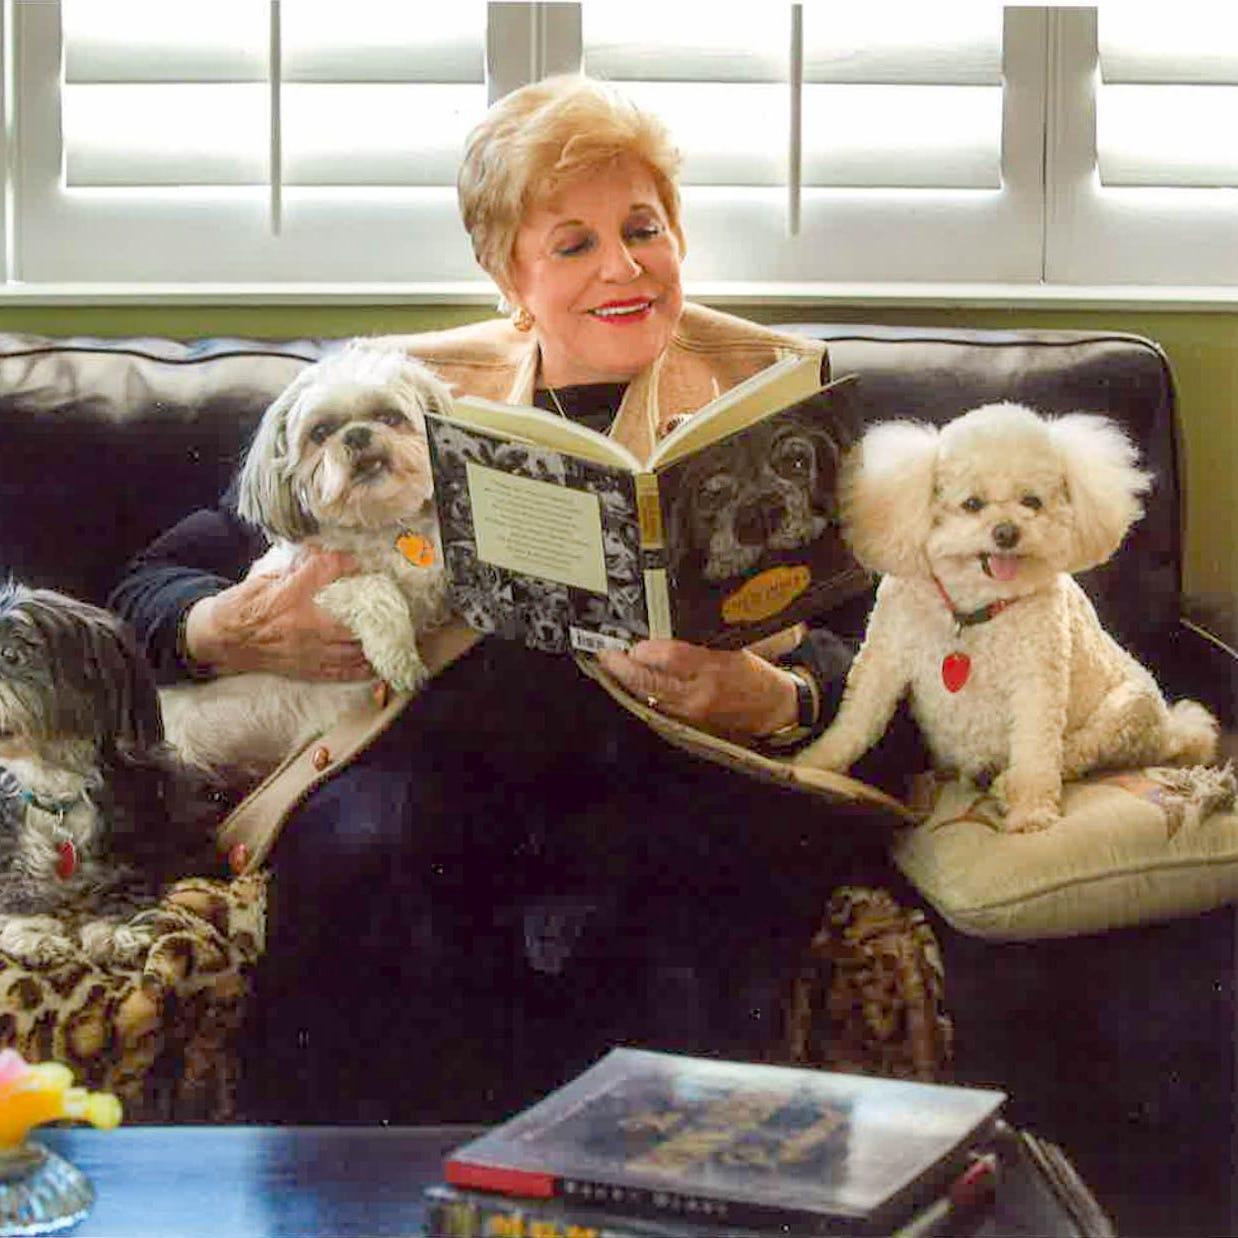 Kaye Ballard's show business legacy an enduring one